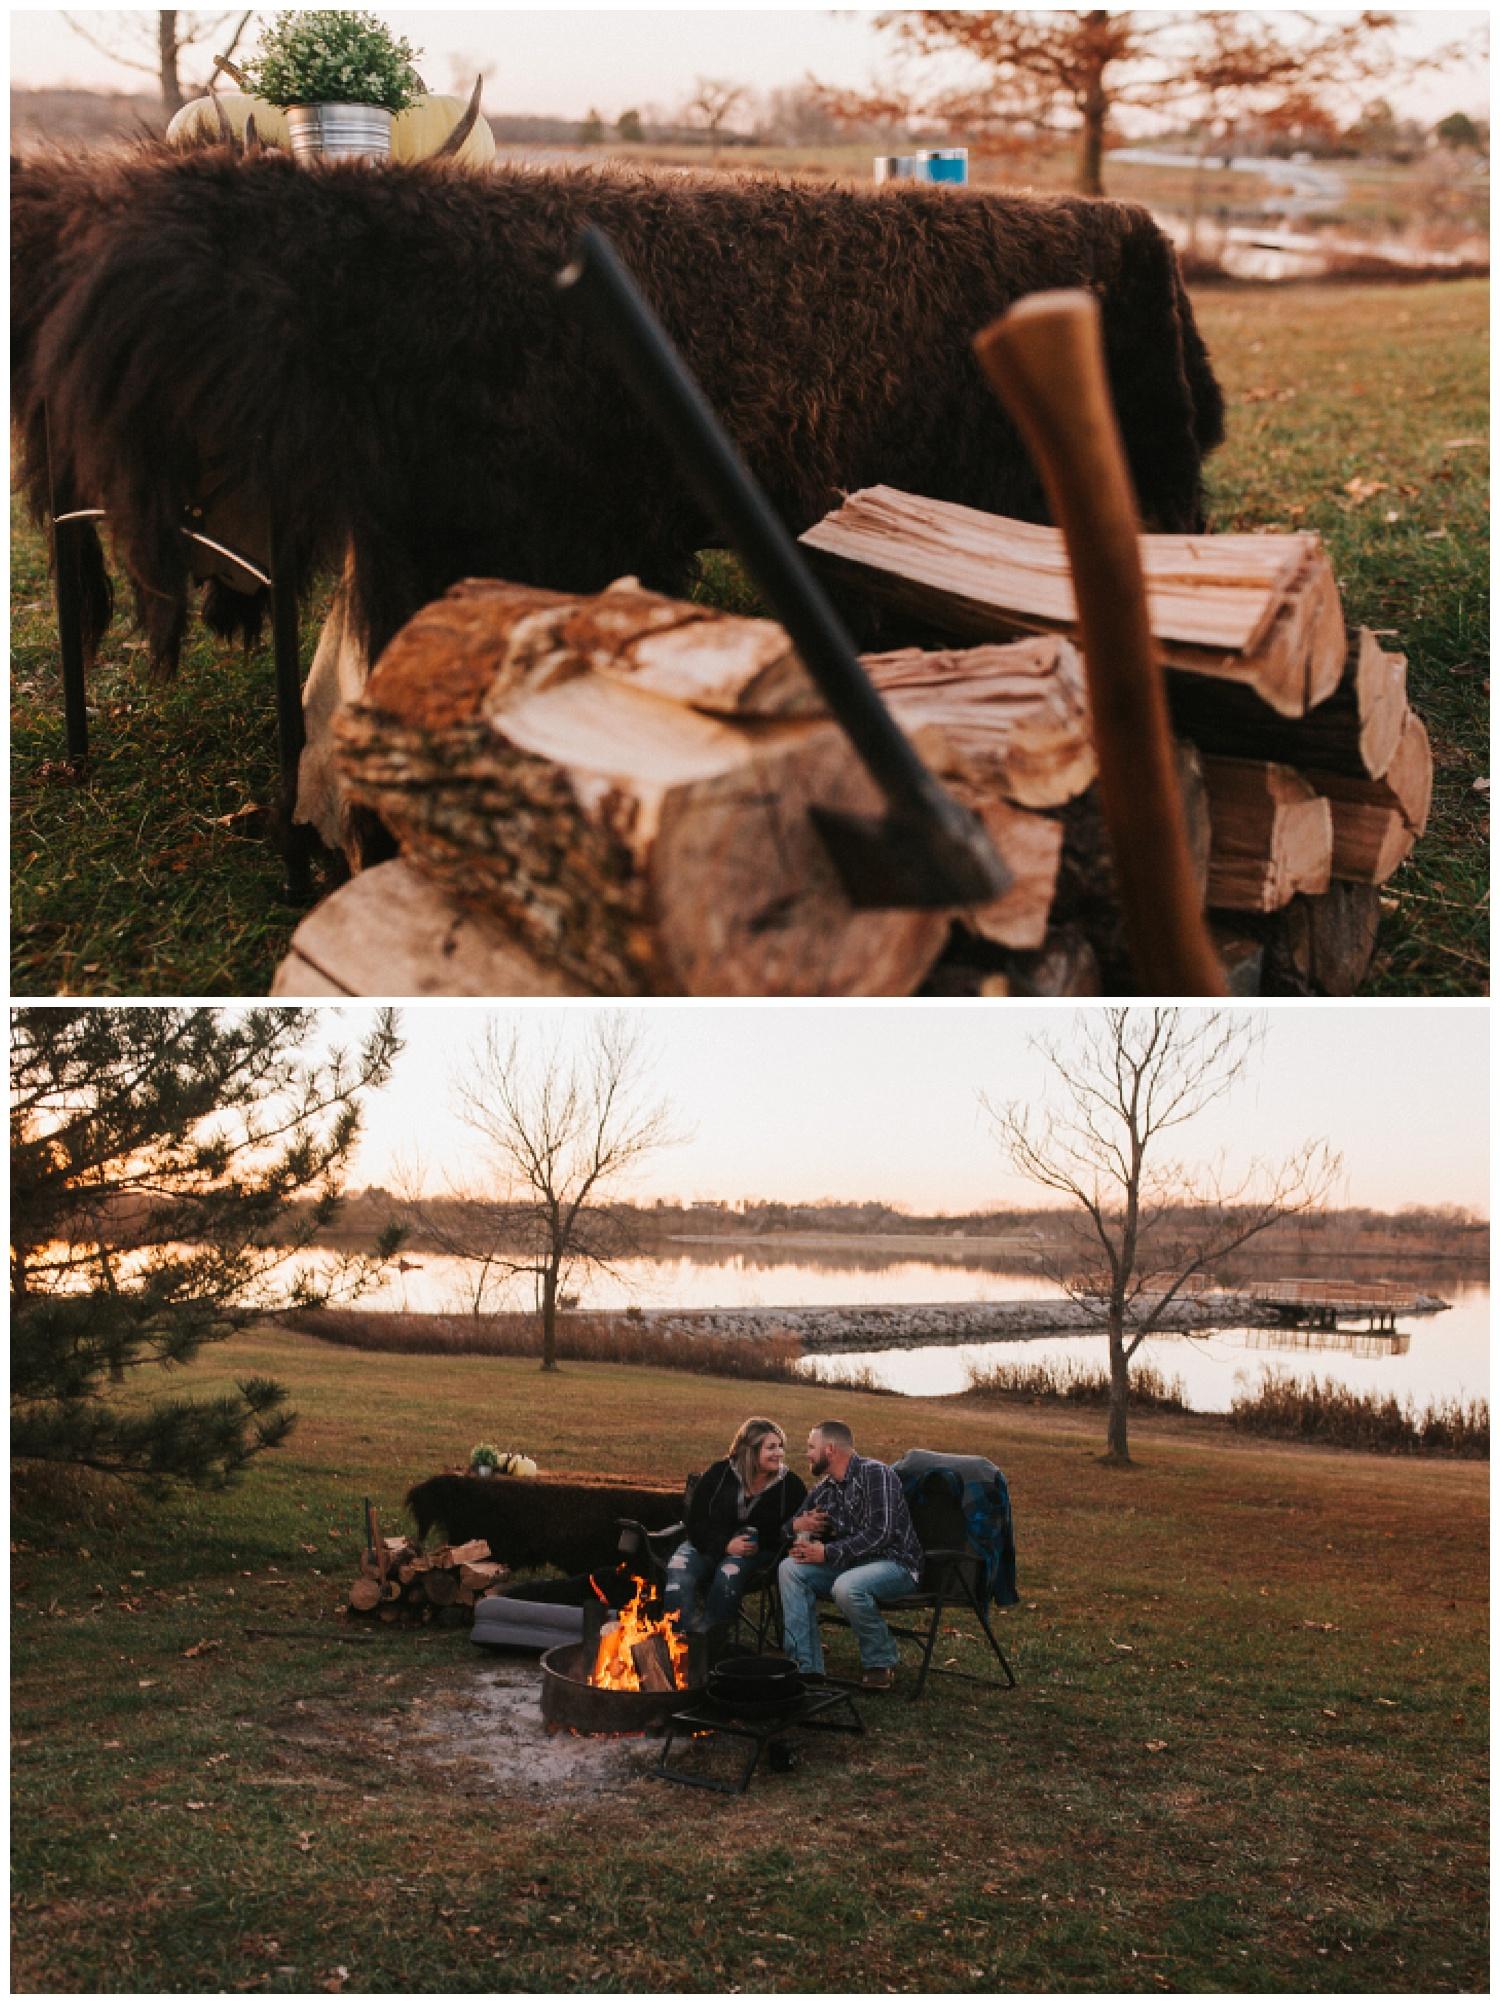 cozy_campfire_campsite_engagement_anniversary_session_nebraska_photographer_haley_chicoine_adventureous_wedding_0022.jpg